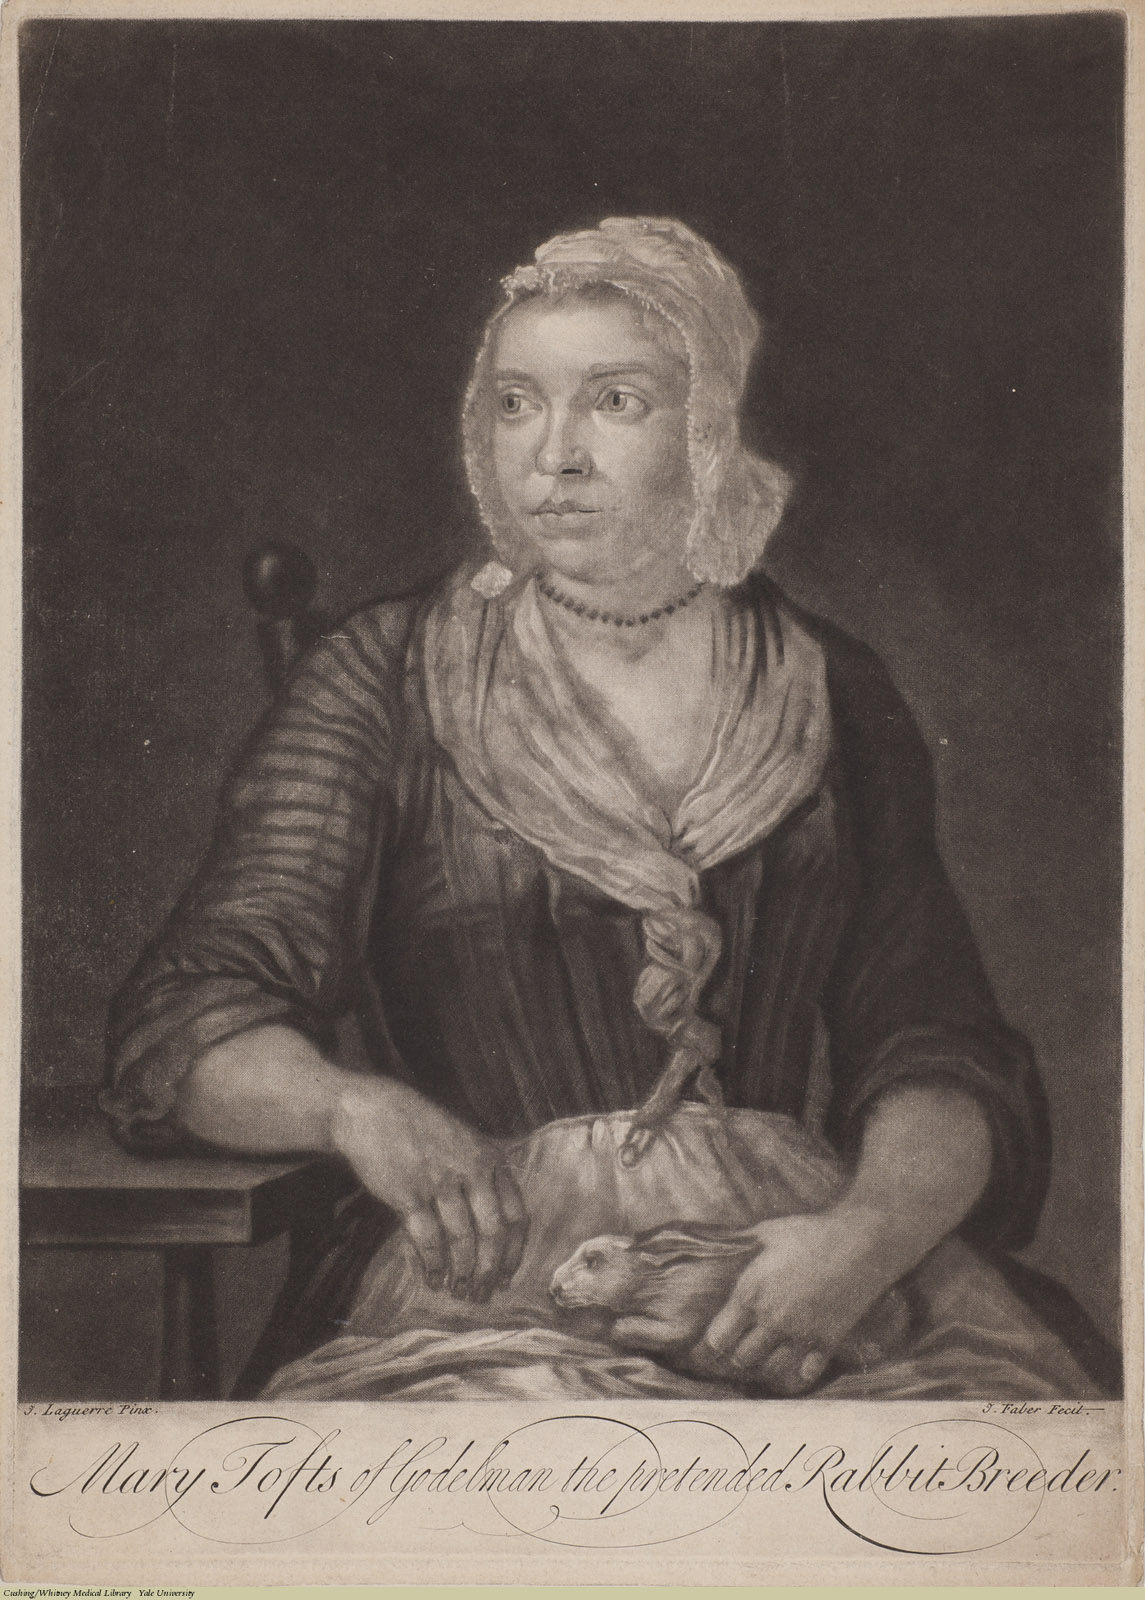 Mary Tofts of Godelman the pretended Rabbit Breeder, mezzotint, John Laguerre, c. 1726.